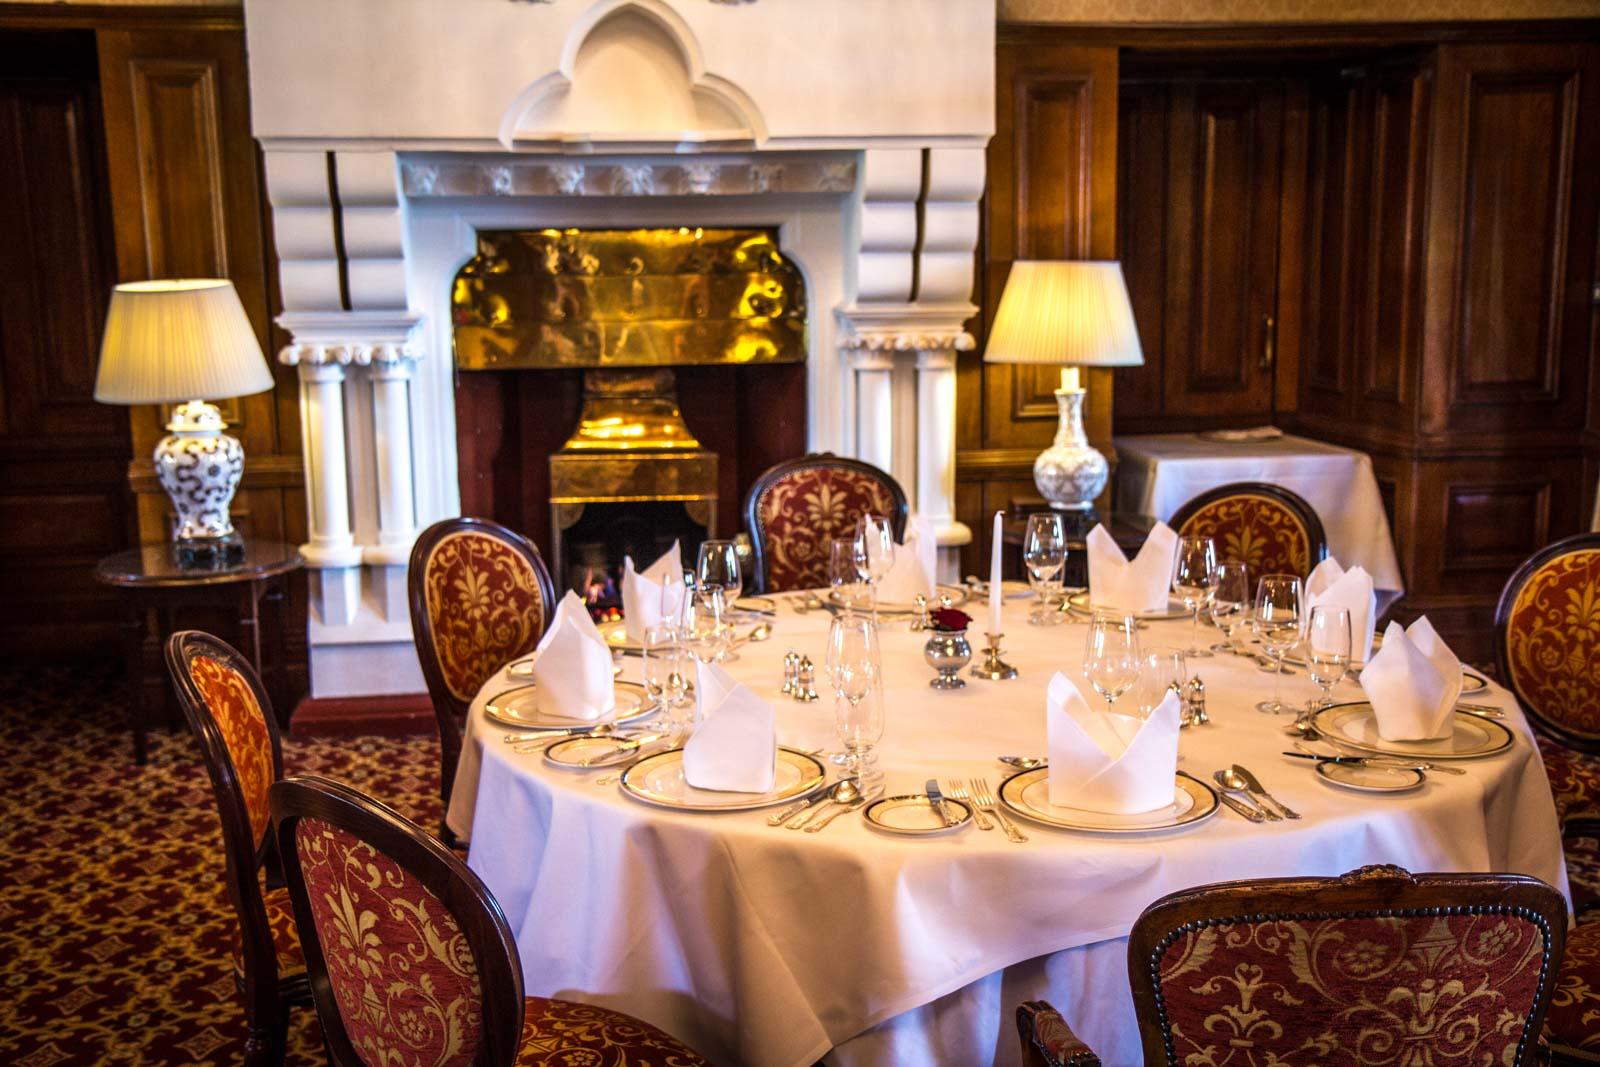 ashford castle, ireland, luxury hotel in ireland